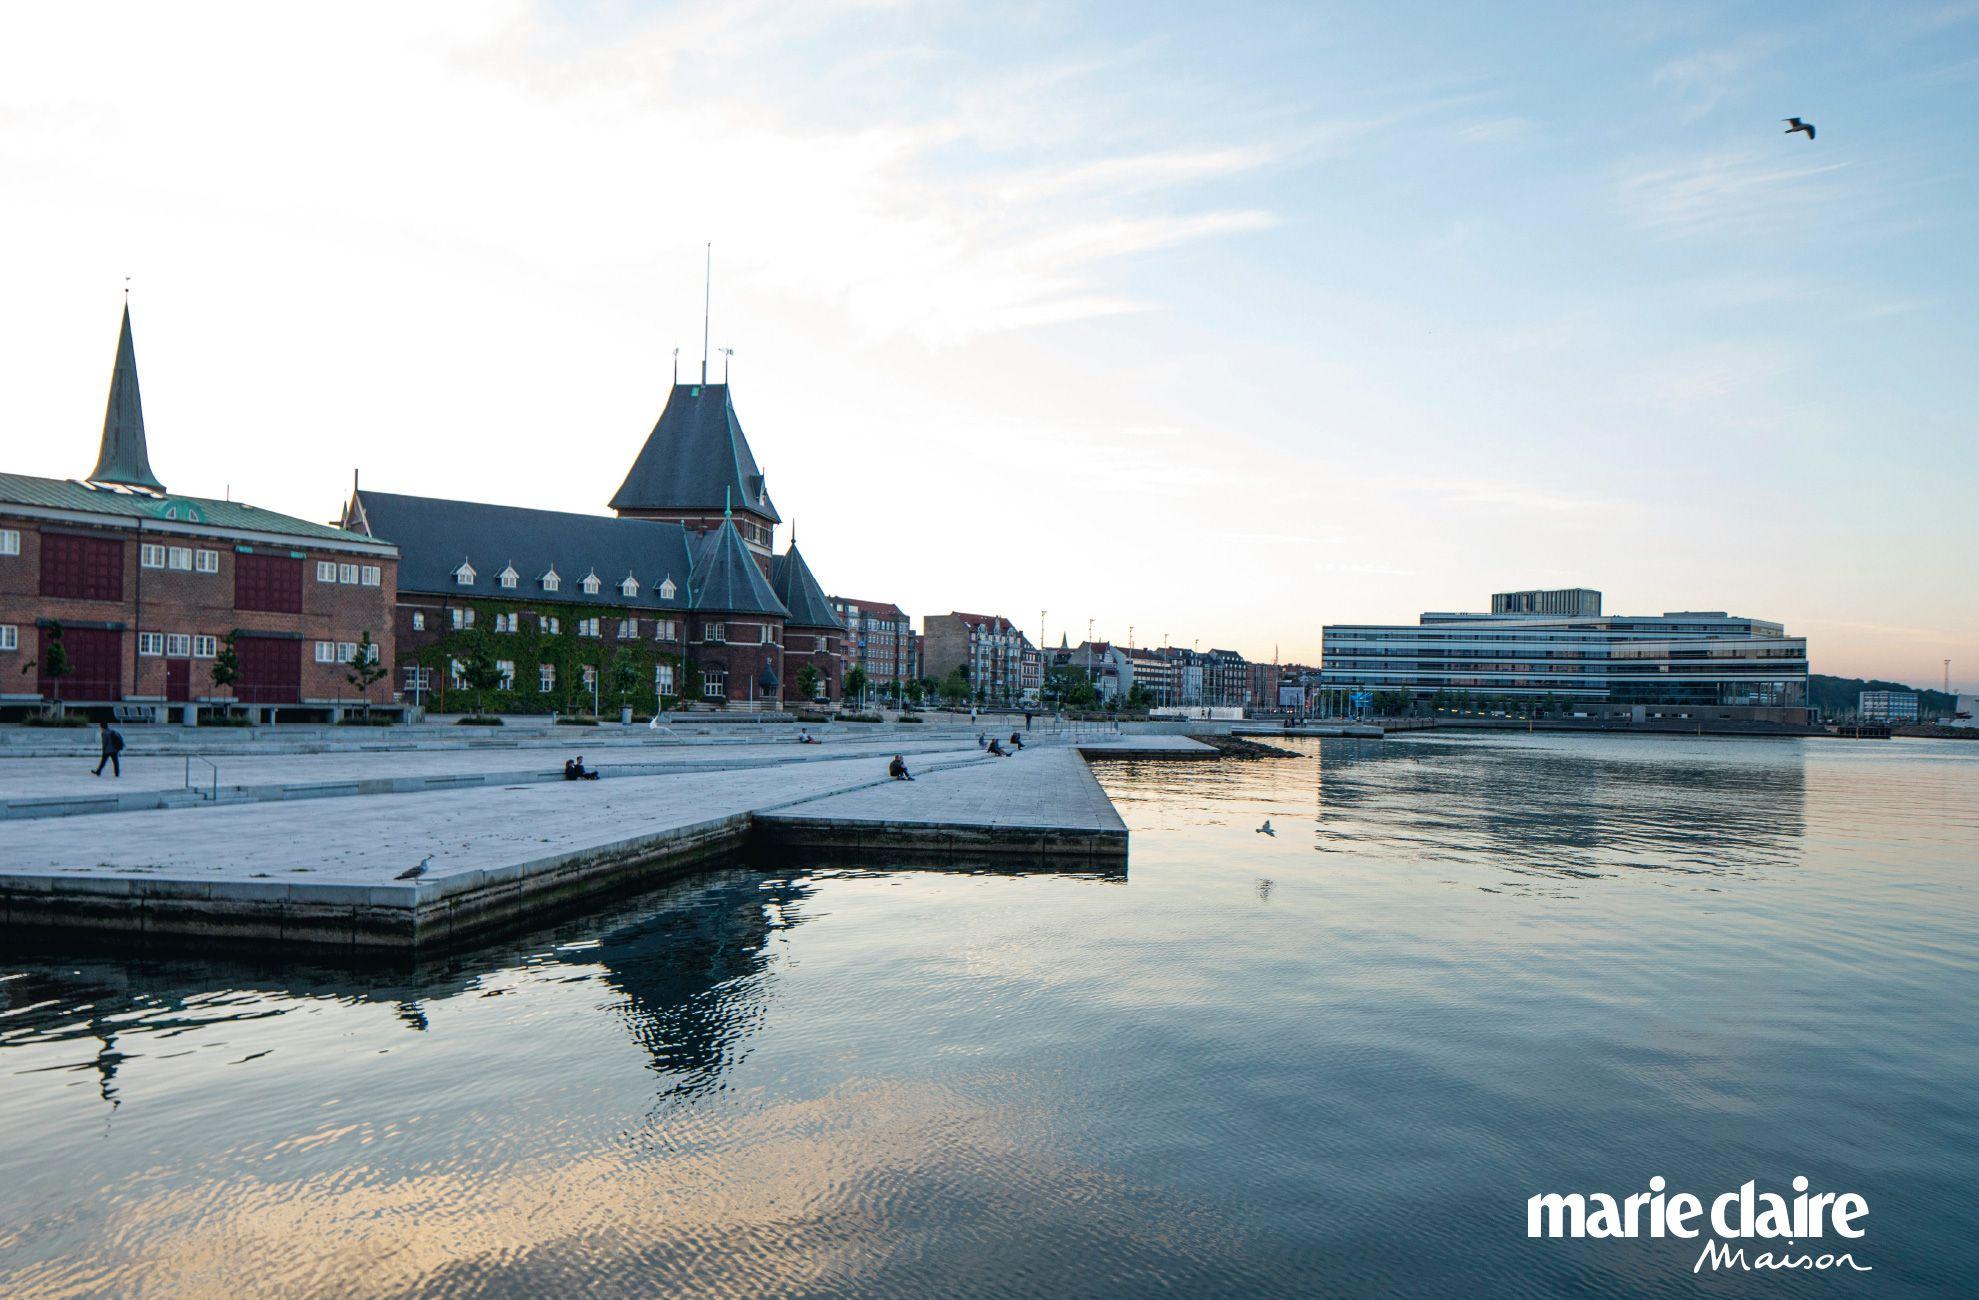 Incontri doganali in Scandinavia